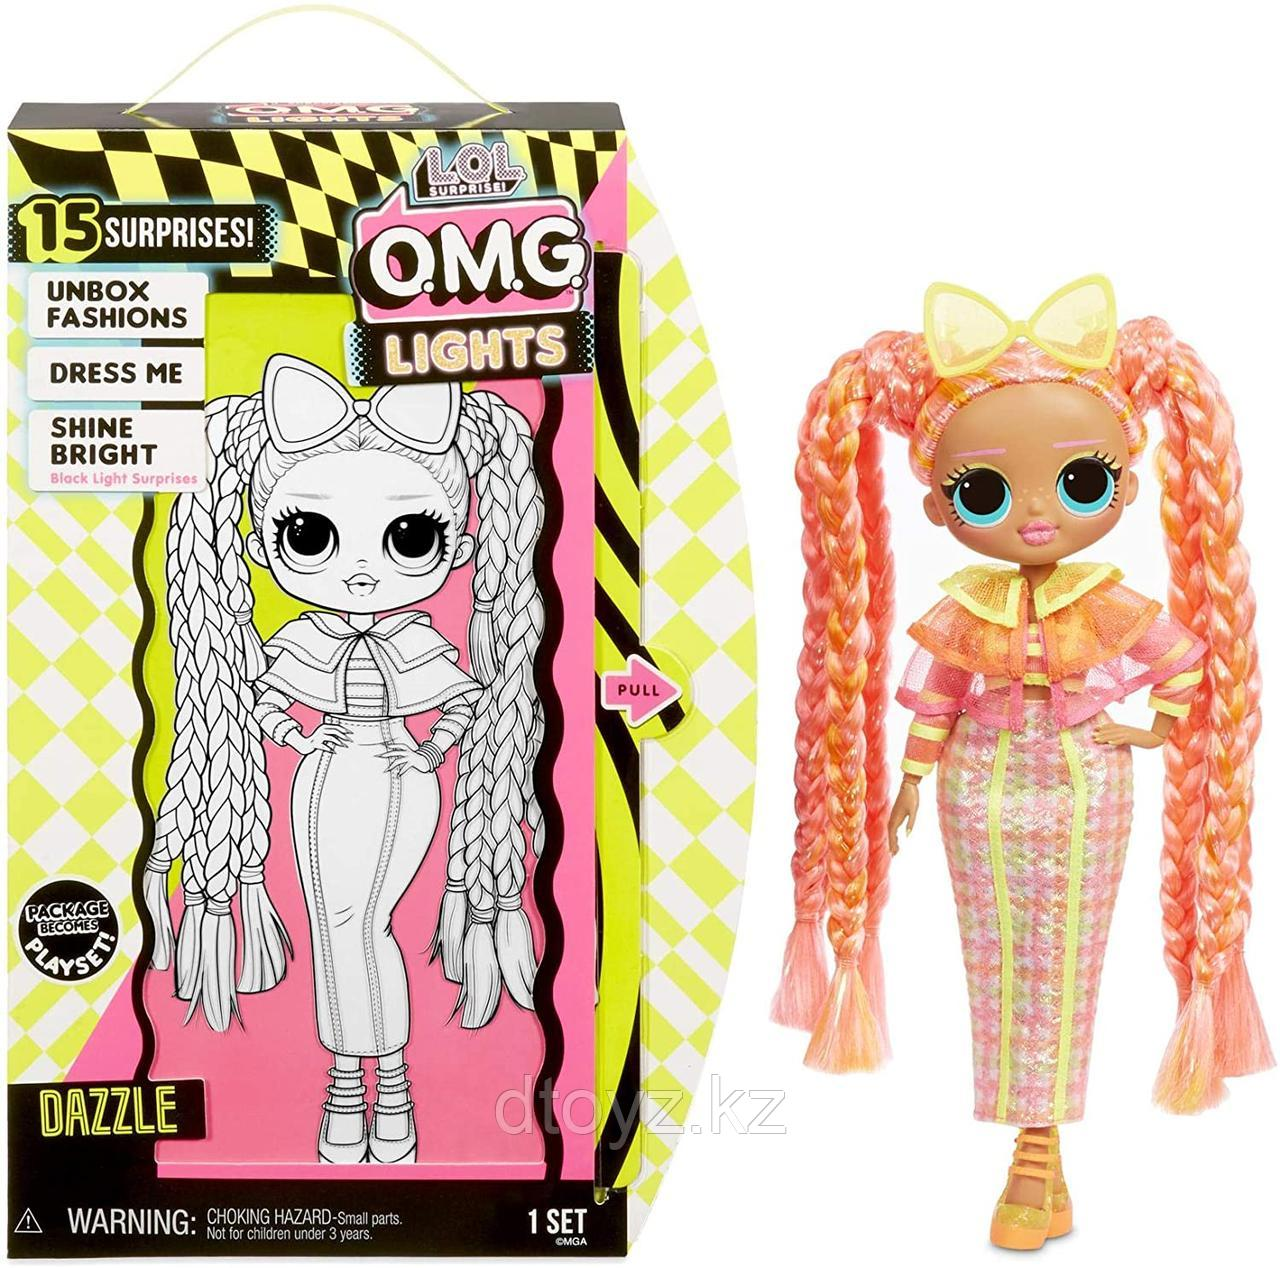 Модная Кукла OMG Lights Dazzle